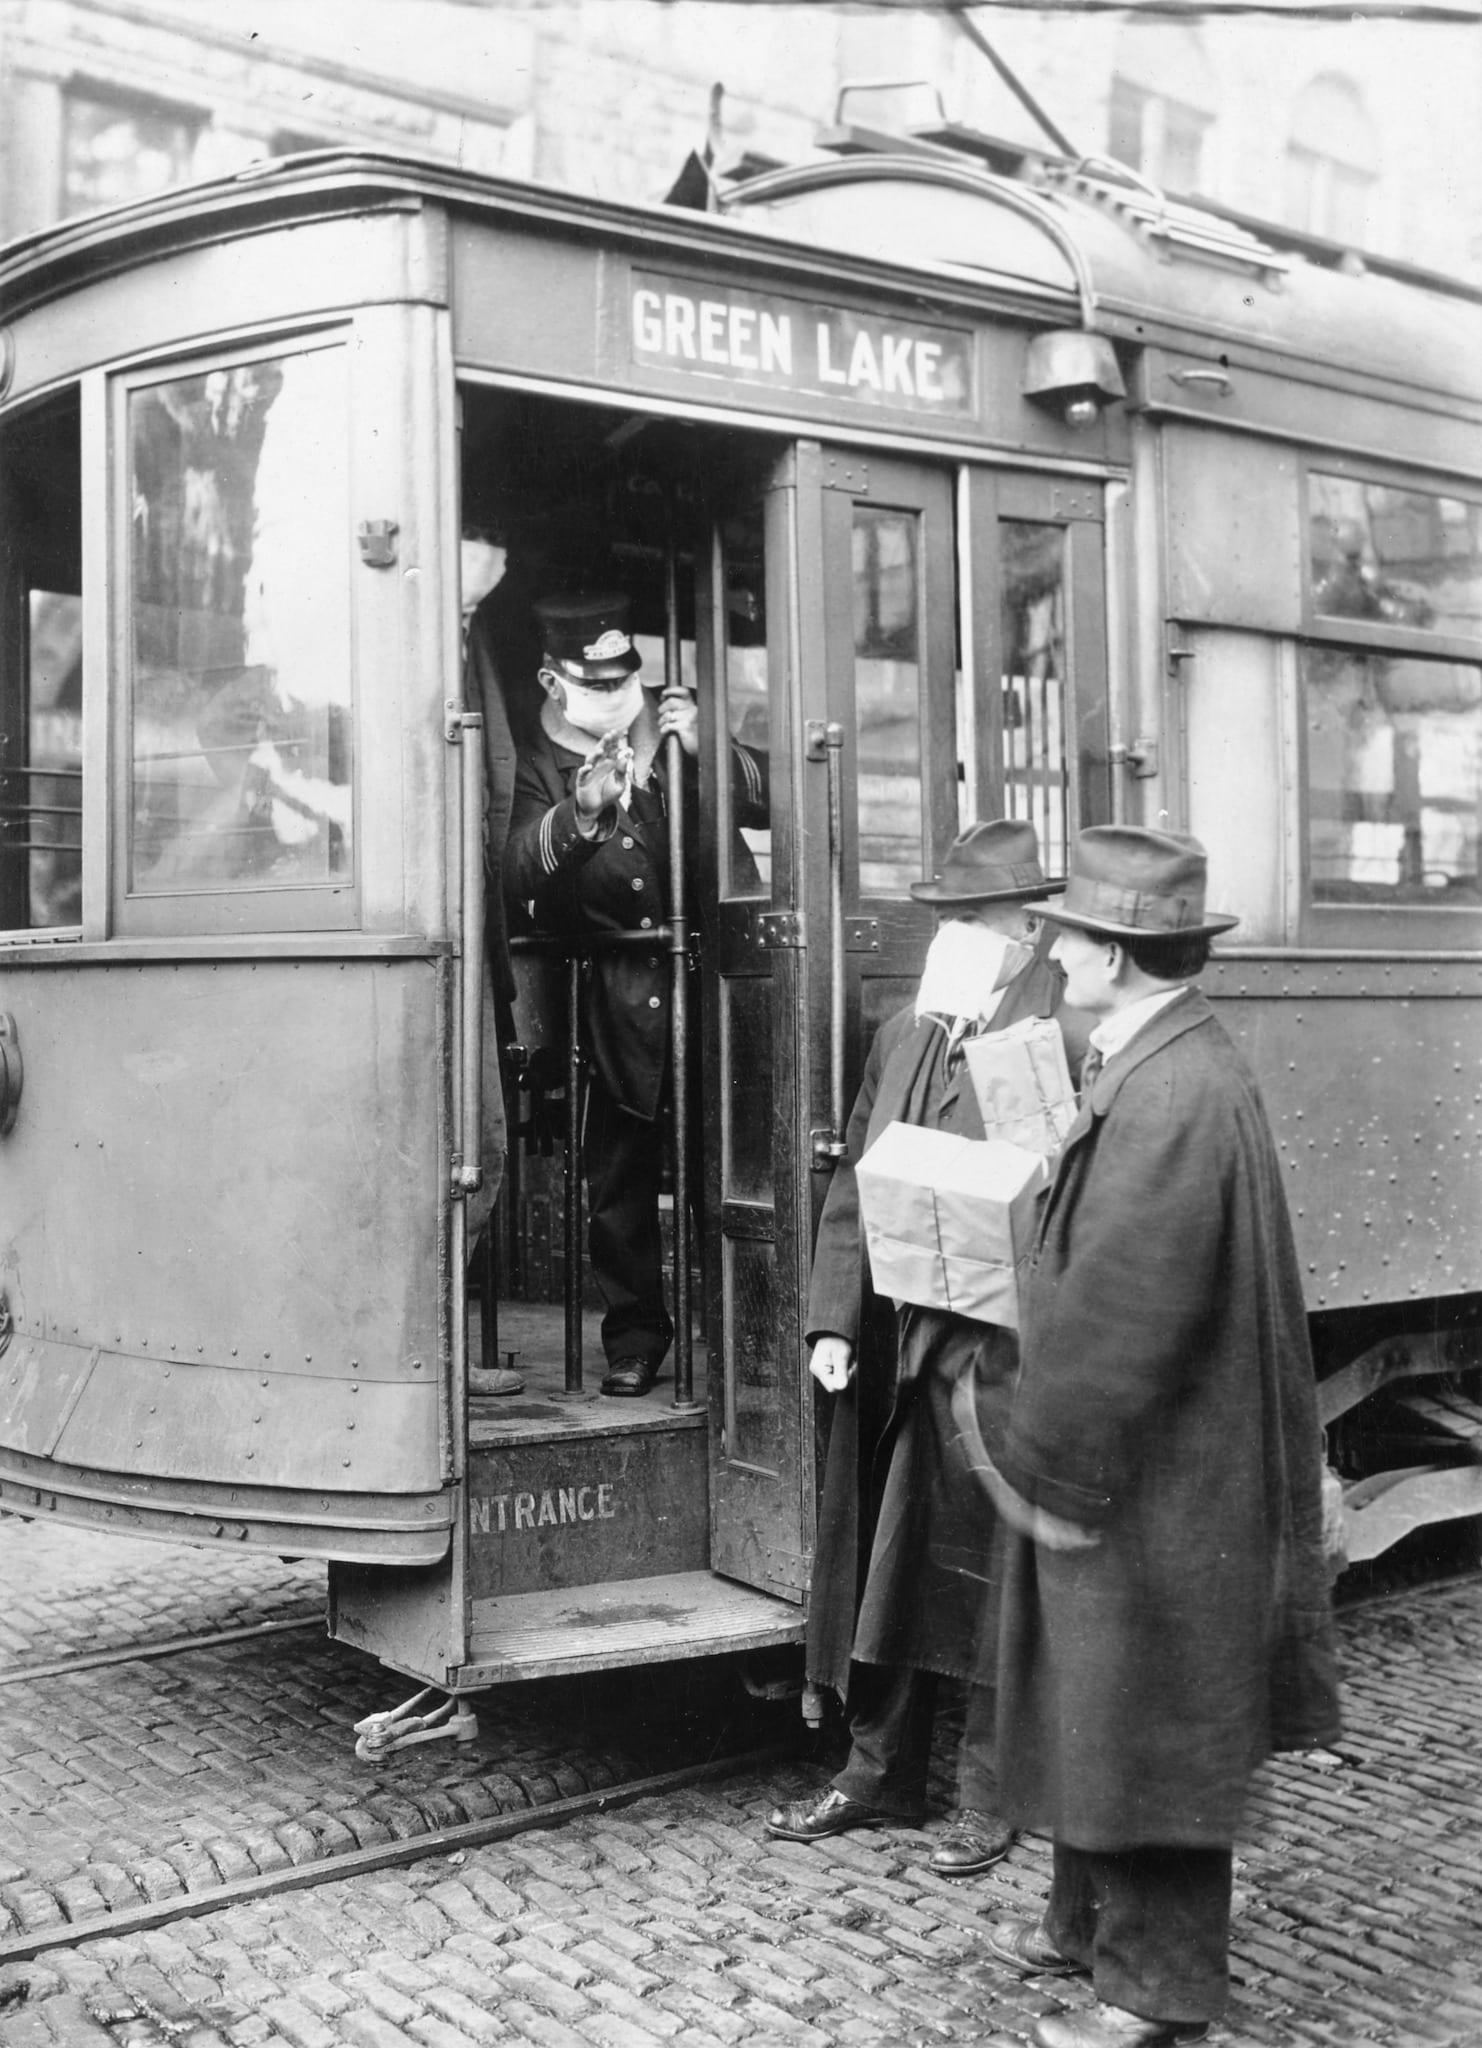 Spanish Flu 1918 Seattle Washington Trolly Passengers Wearing Masks